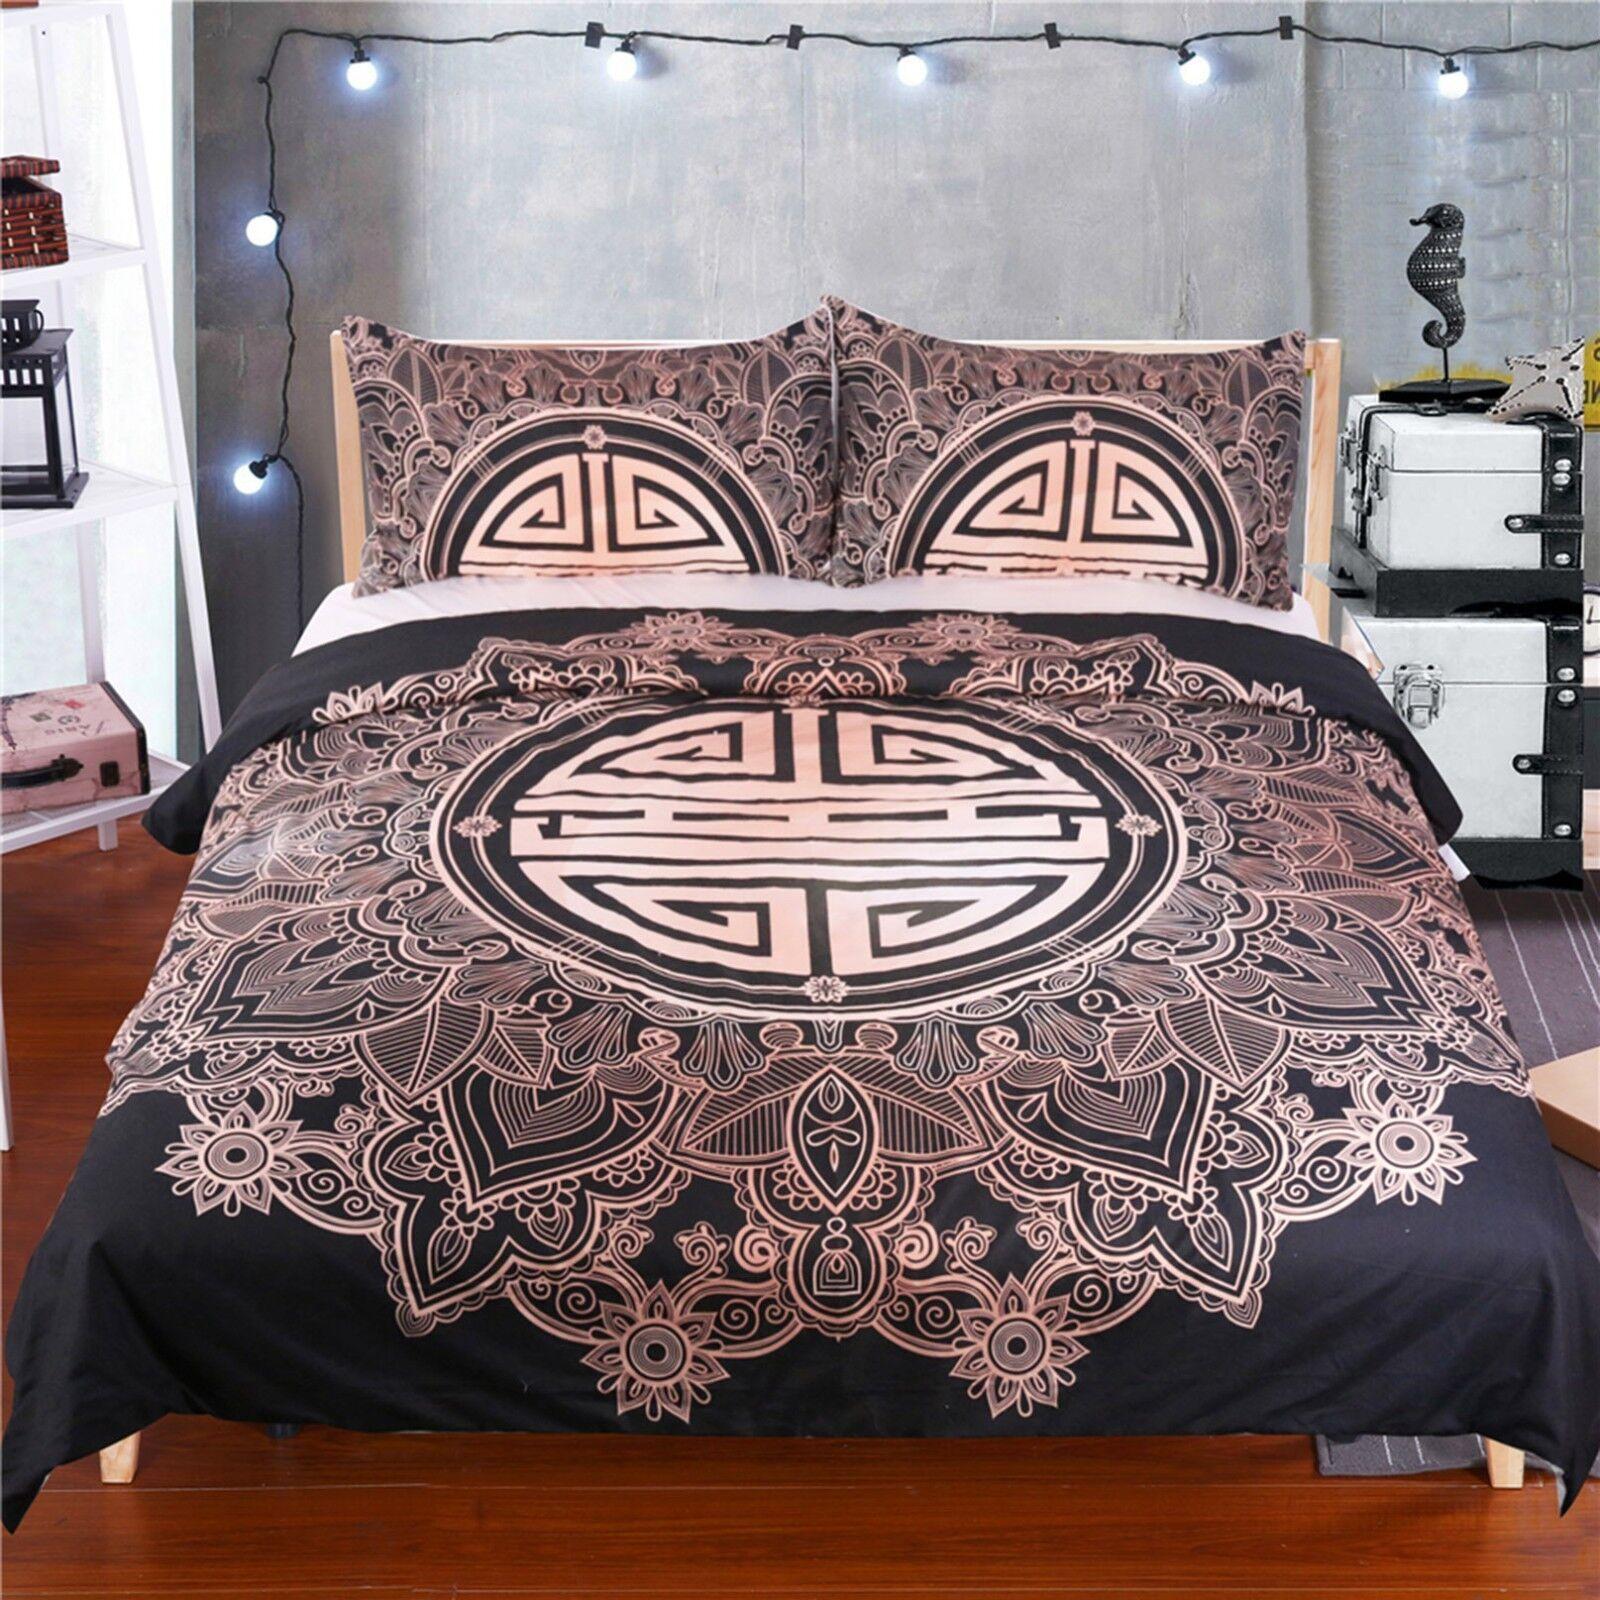 3D Retro Pattern 407 Bed Pillowcases Quilt Duvet Cover Set Single Queen CA